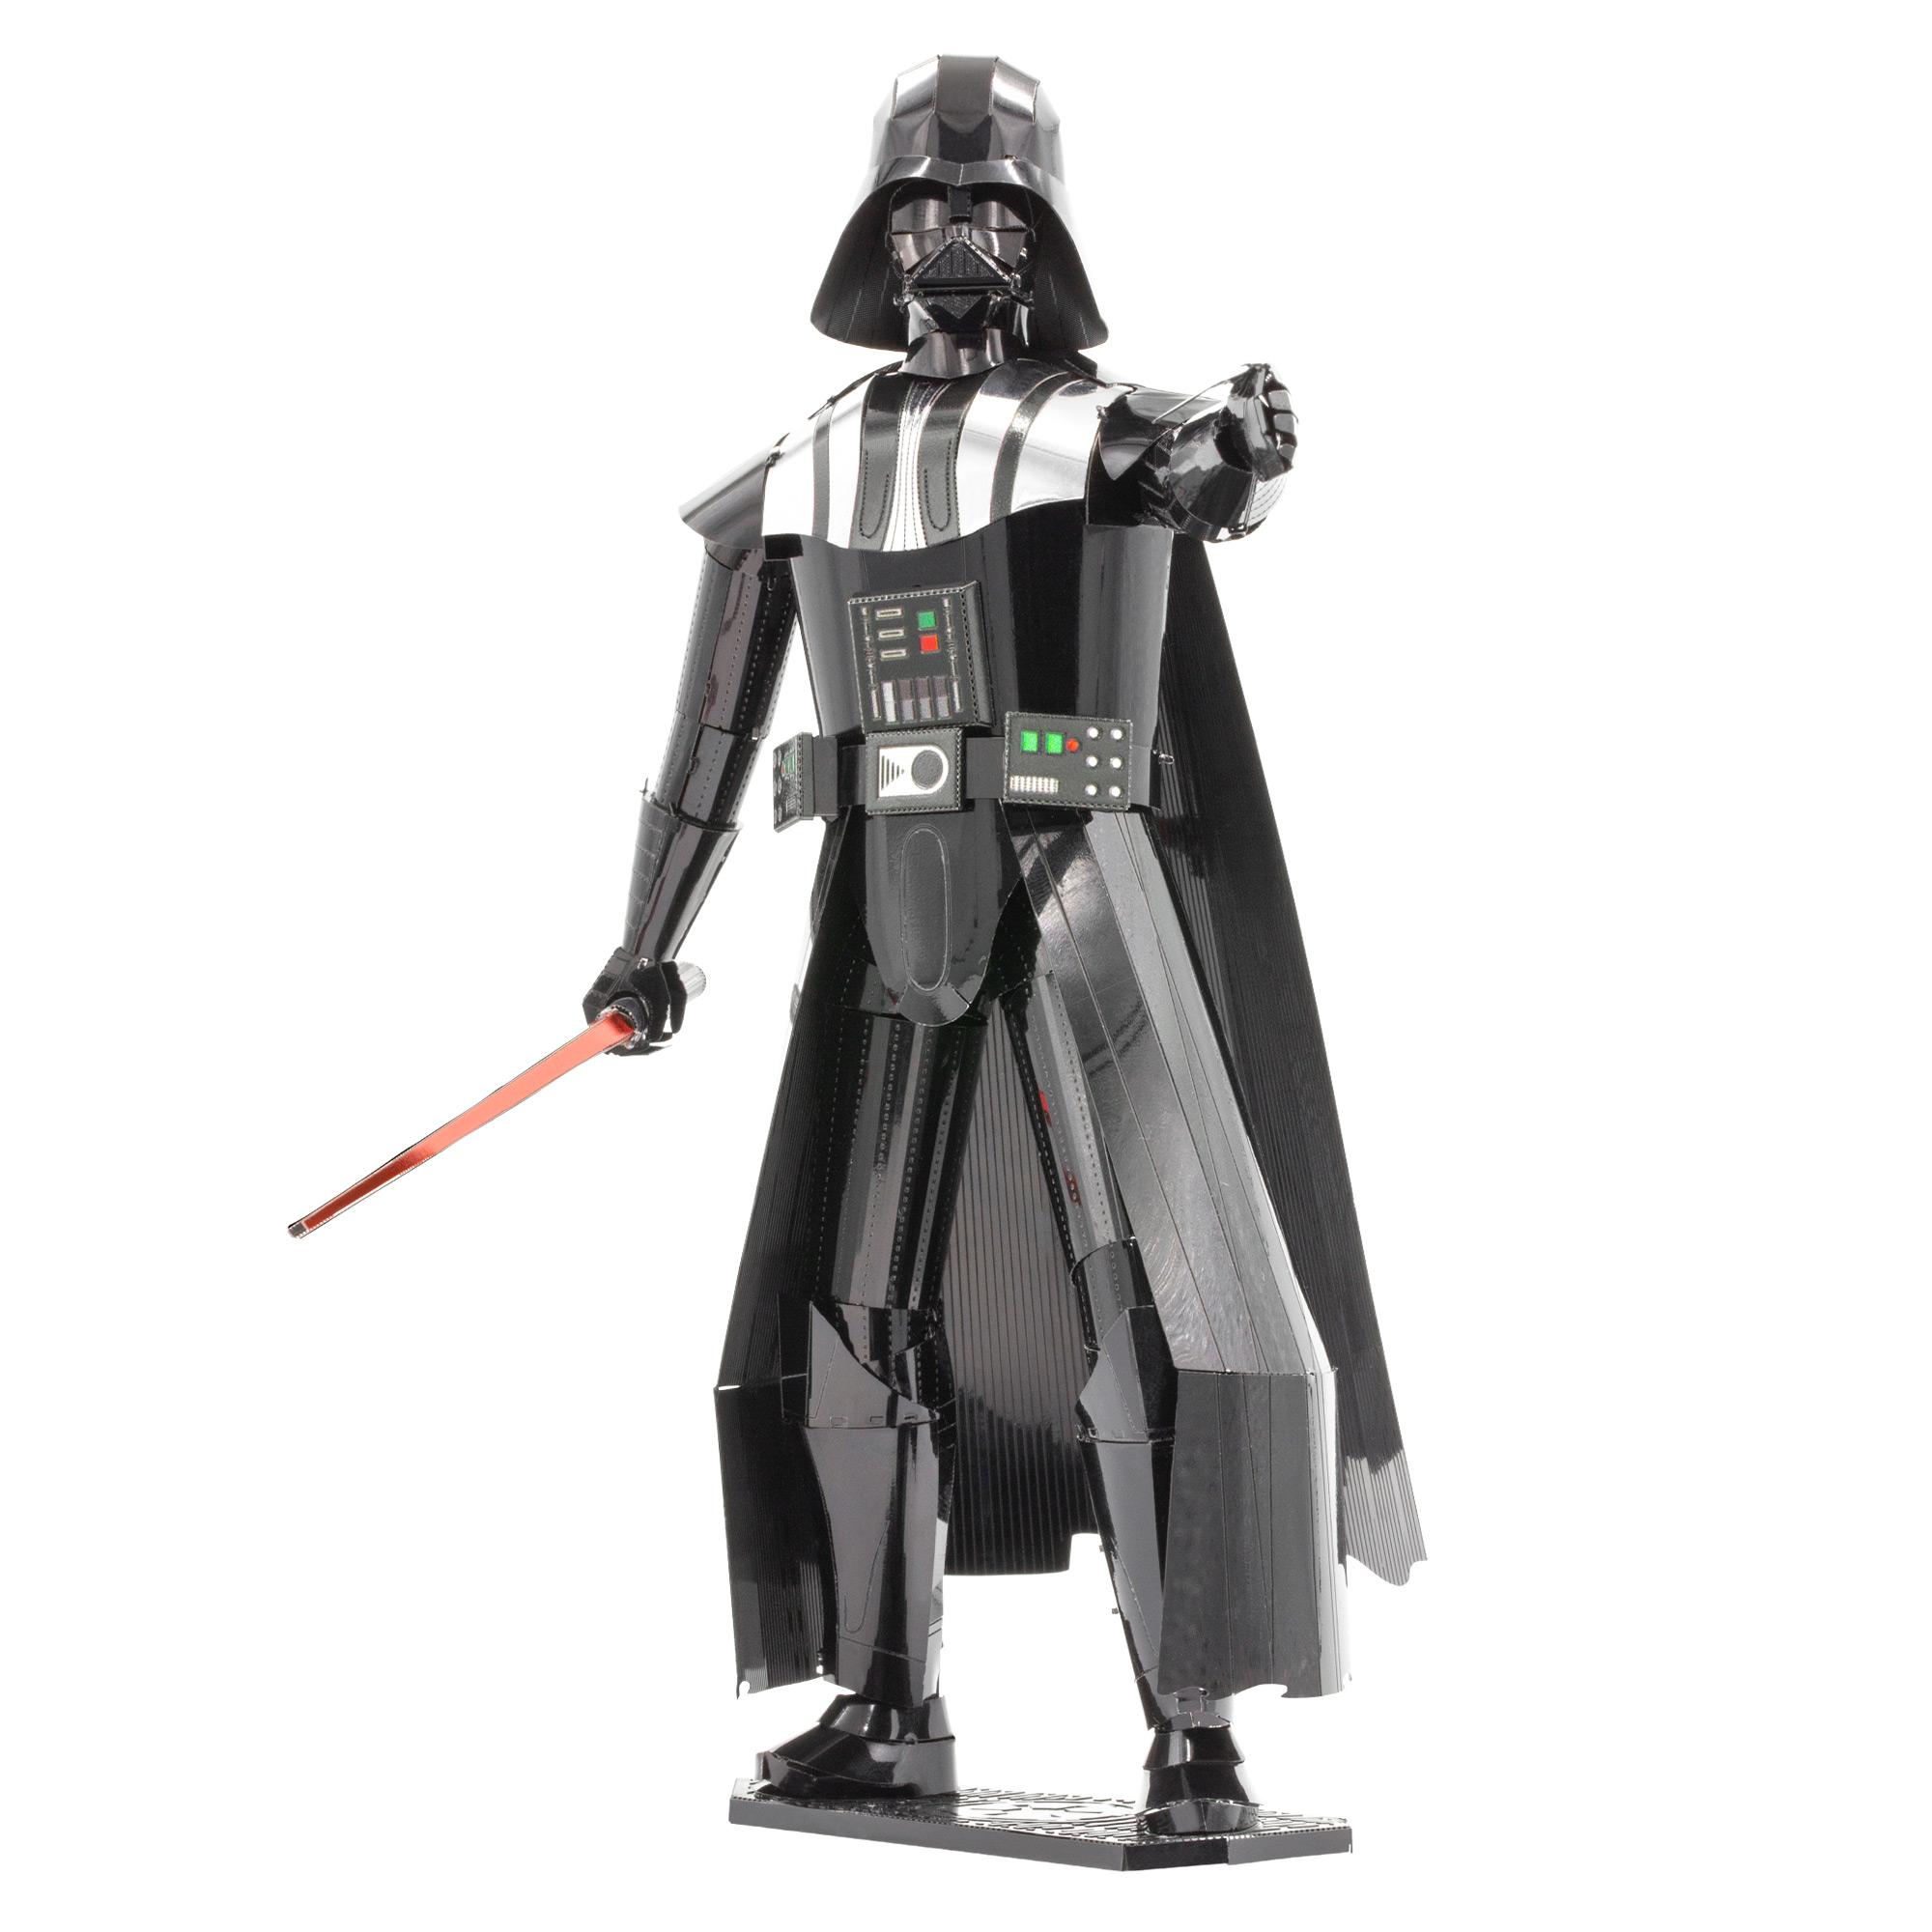 Darth Vader - Star Wars Movies / Books / TV Metal Puzzles